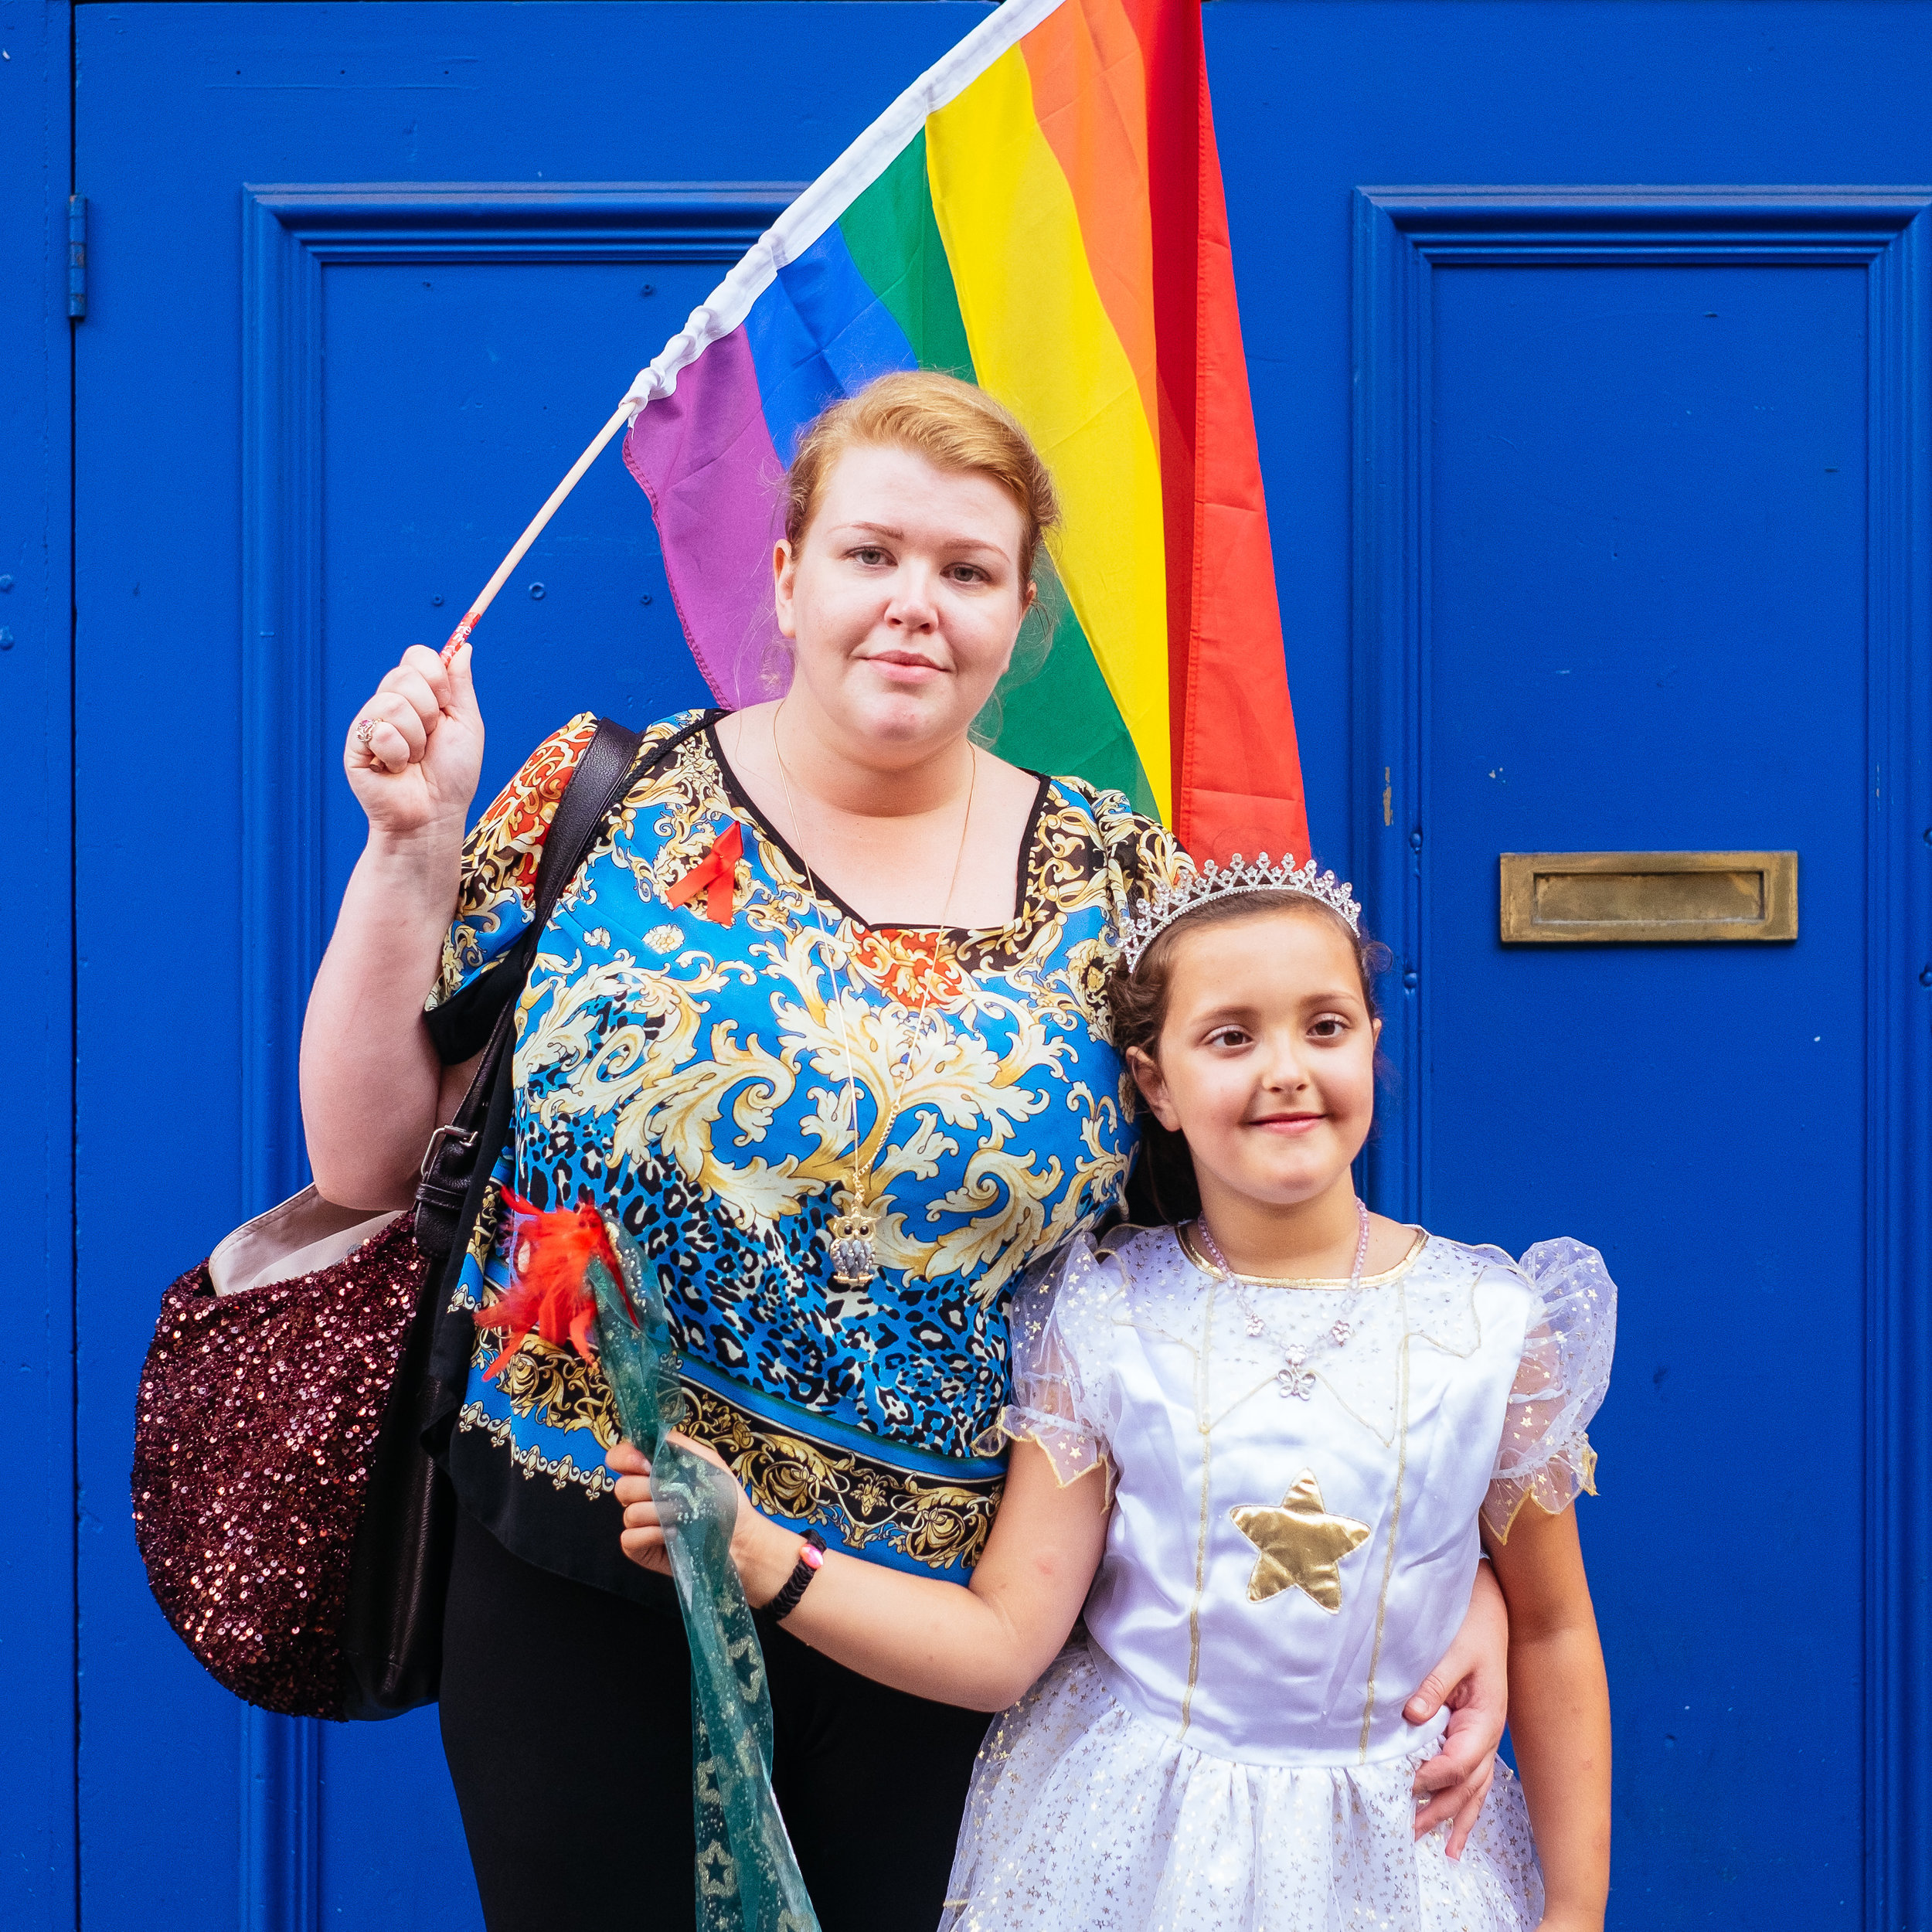 Liverpool Pride 2014